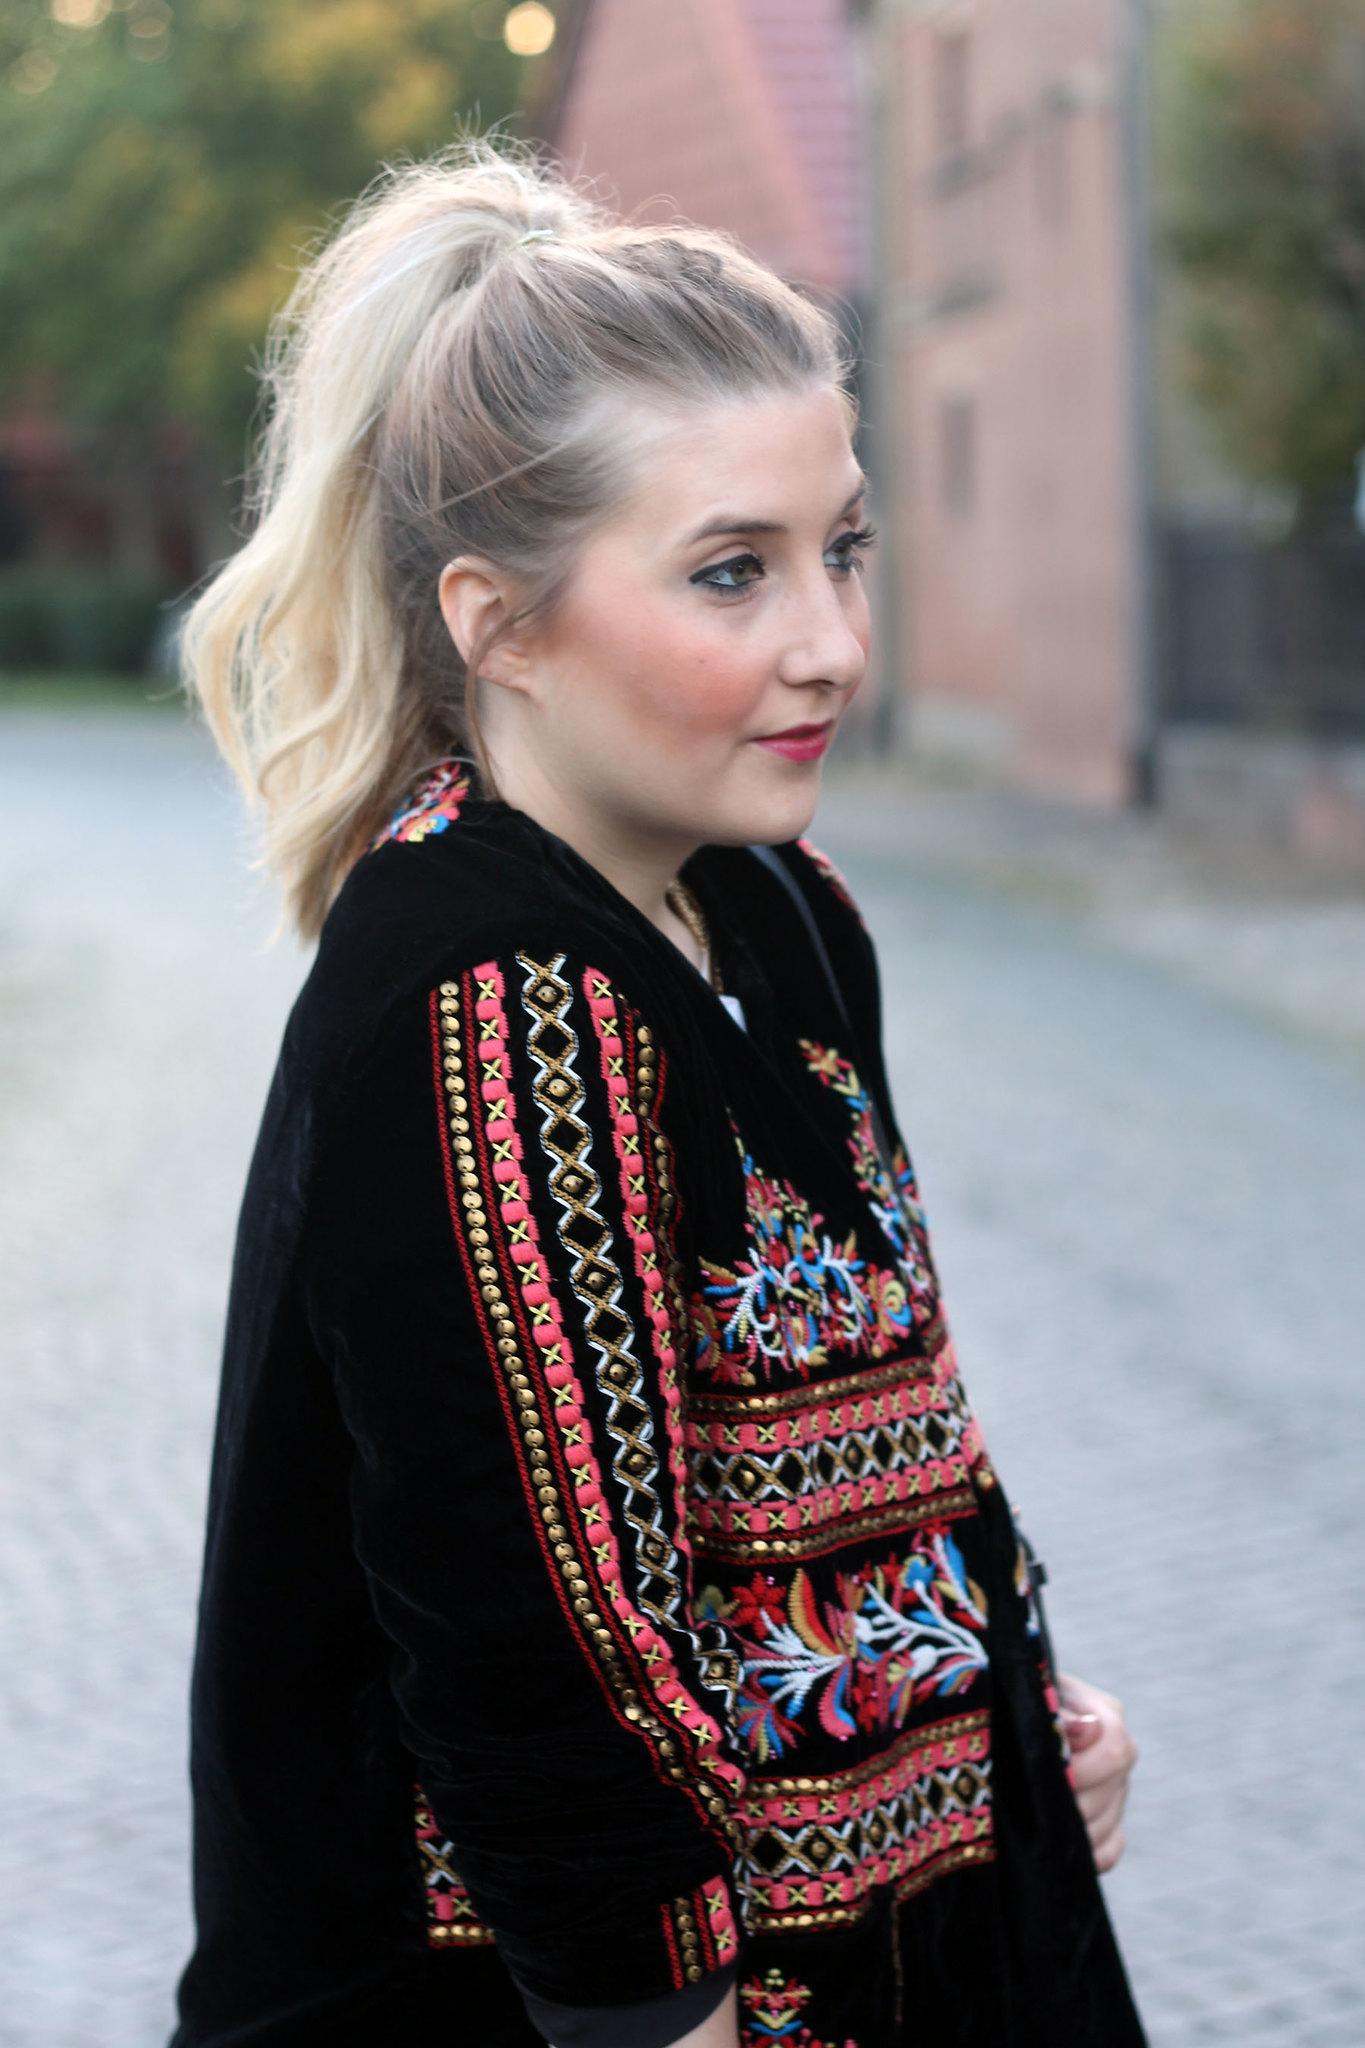 outfit-modeblog-style-trend-boho-jacke-beliebte-blogs-blogger